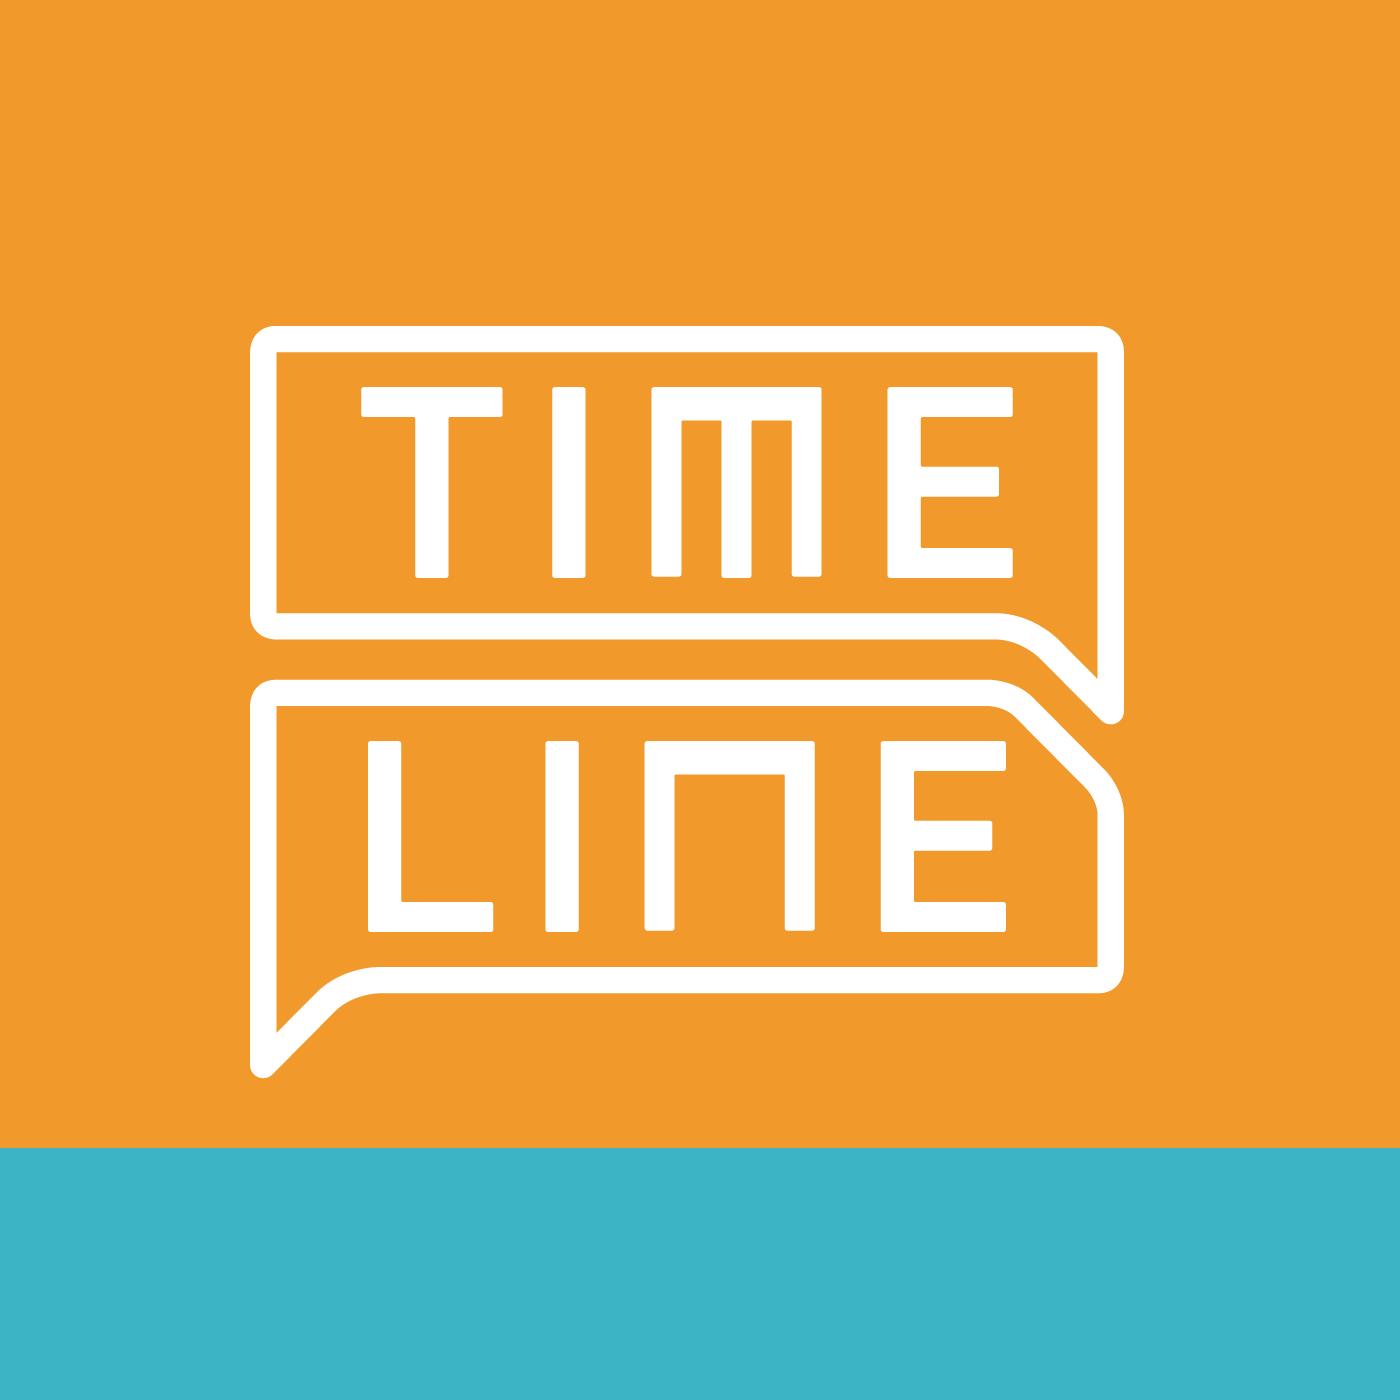 Timeline Ga�cha - 19/10/2016